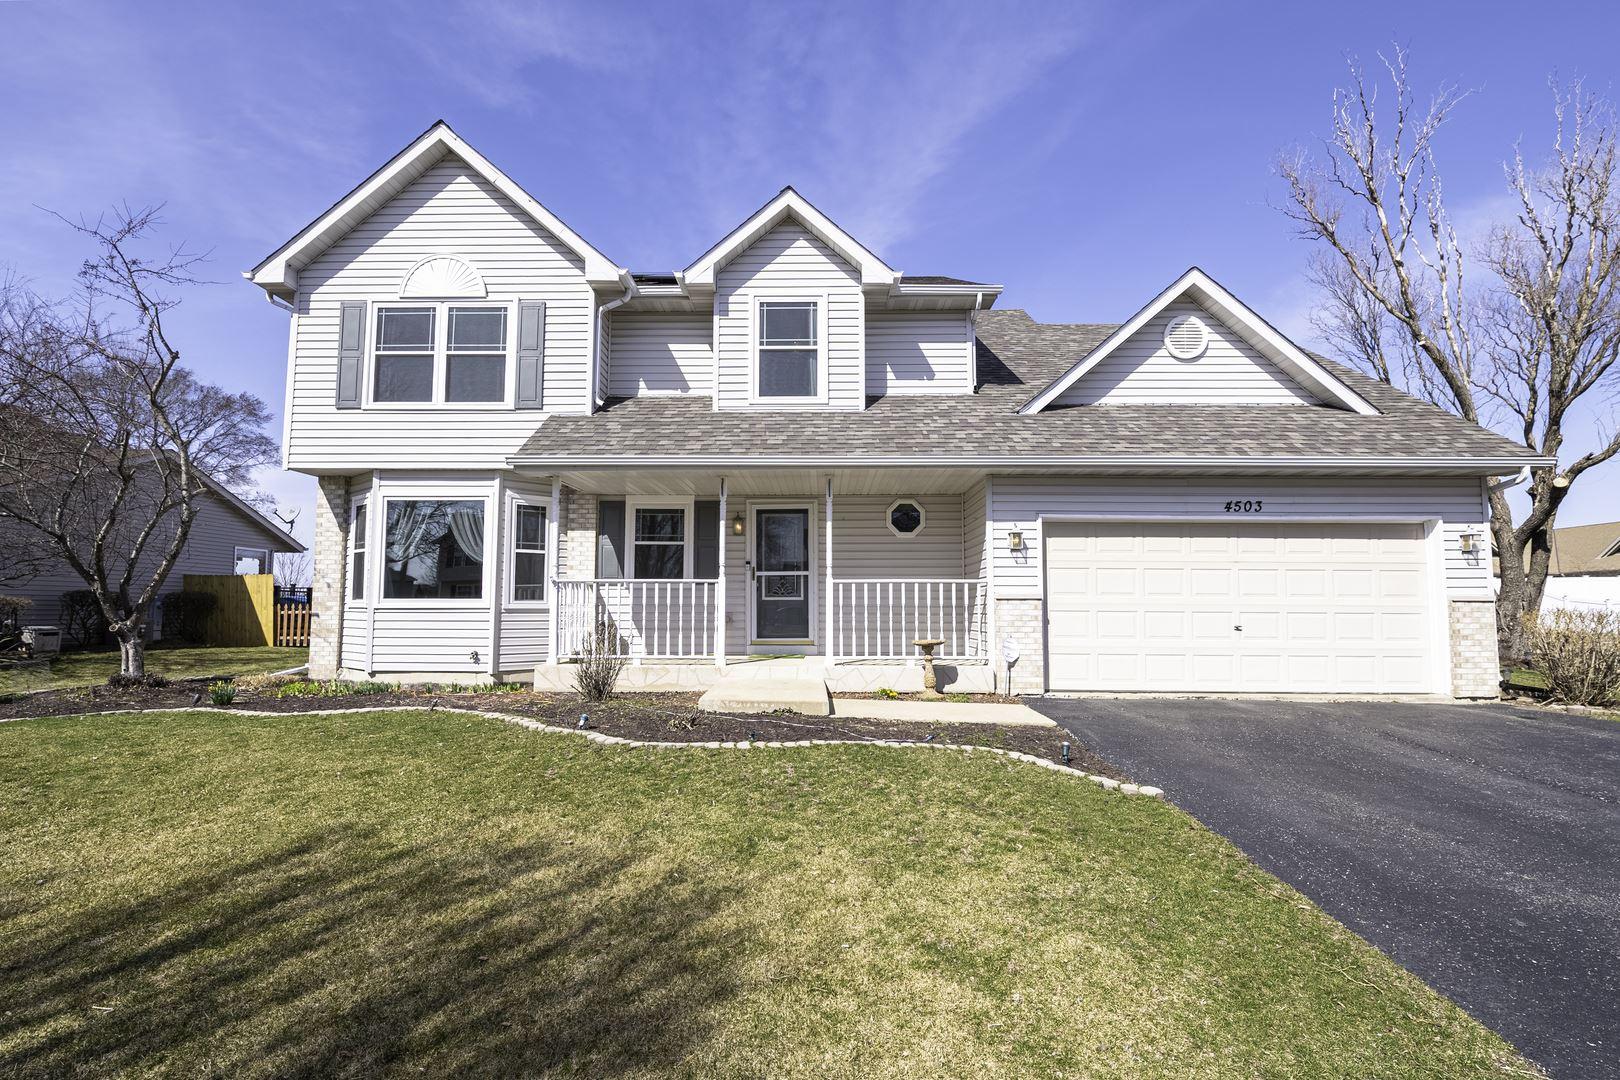 Photo of 4503 Northmont Drive, Plainfield, IL 60586 (MLS # 11001435)